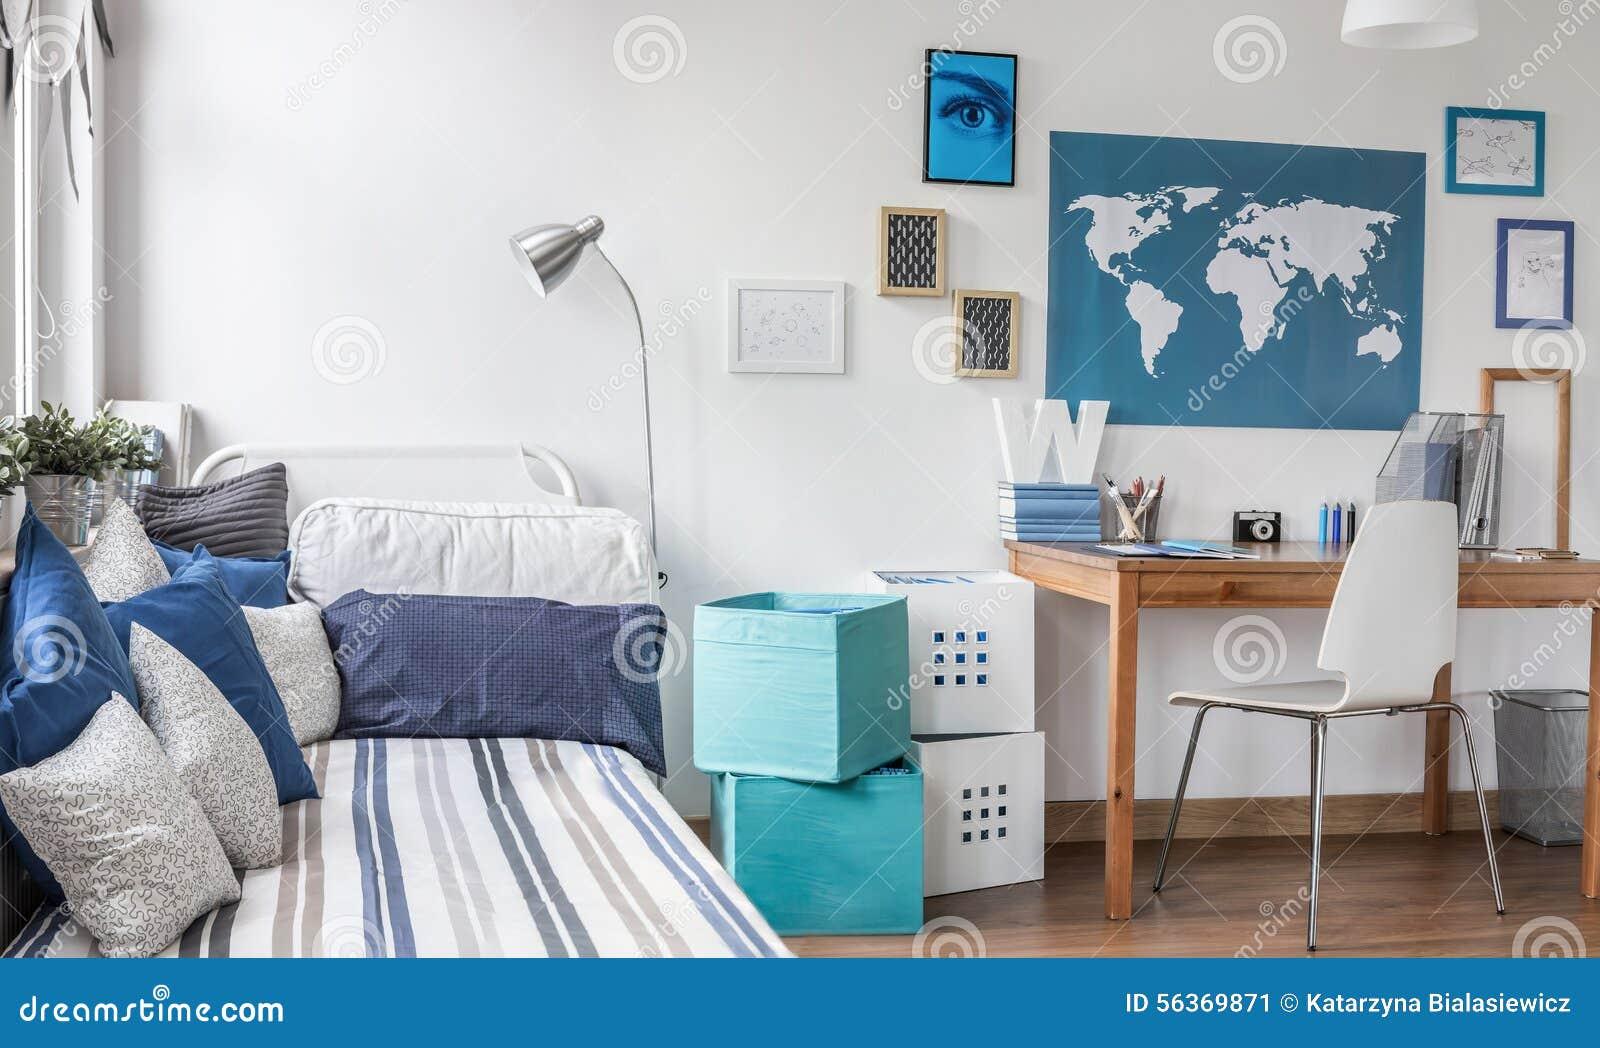 Teenager Room Interior Design Realistic Image Cartoon